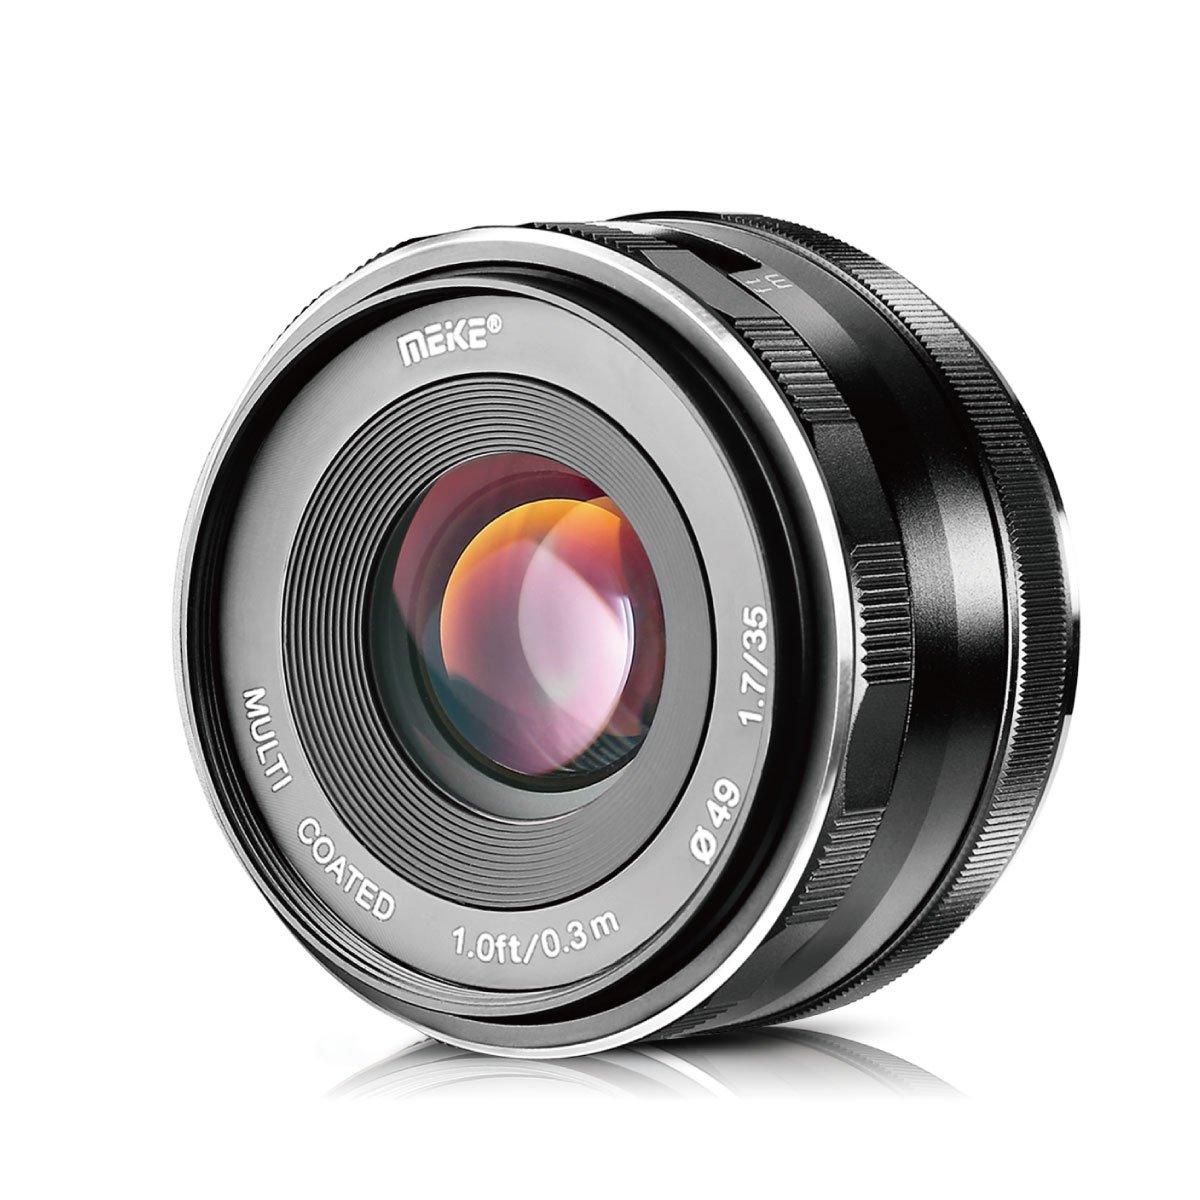 Asus U35F Camera Driver Download